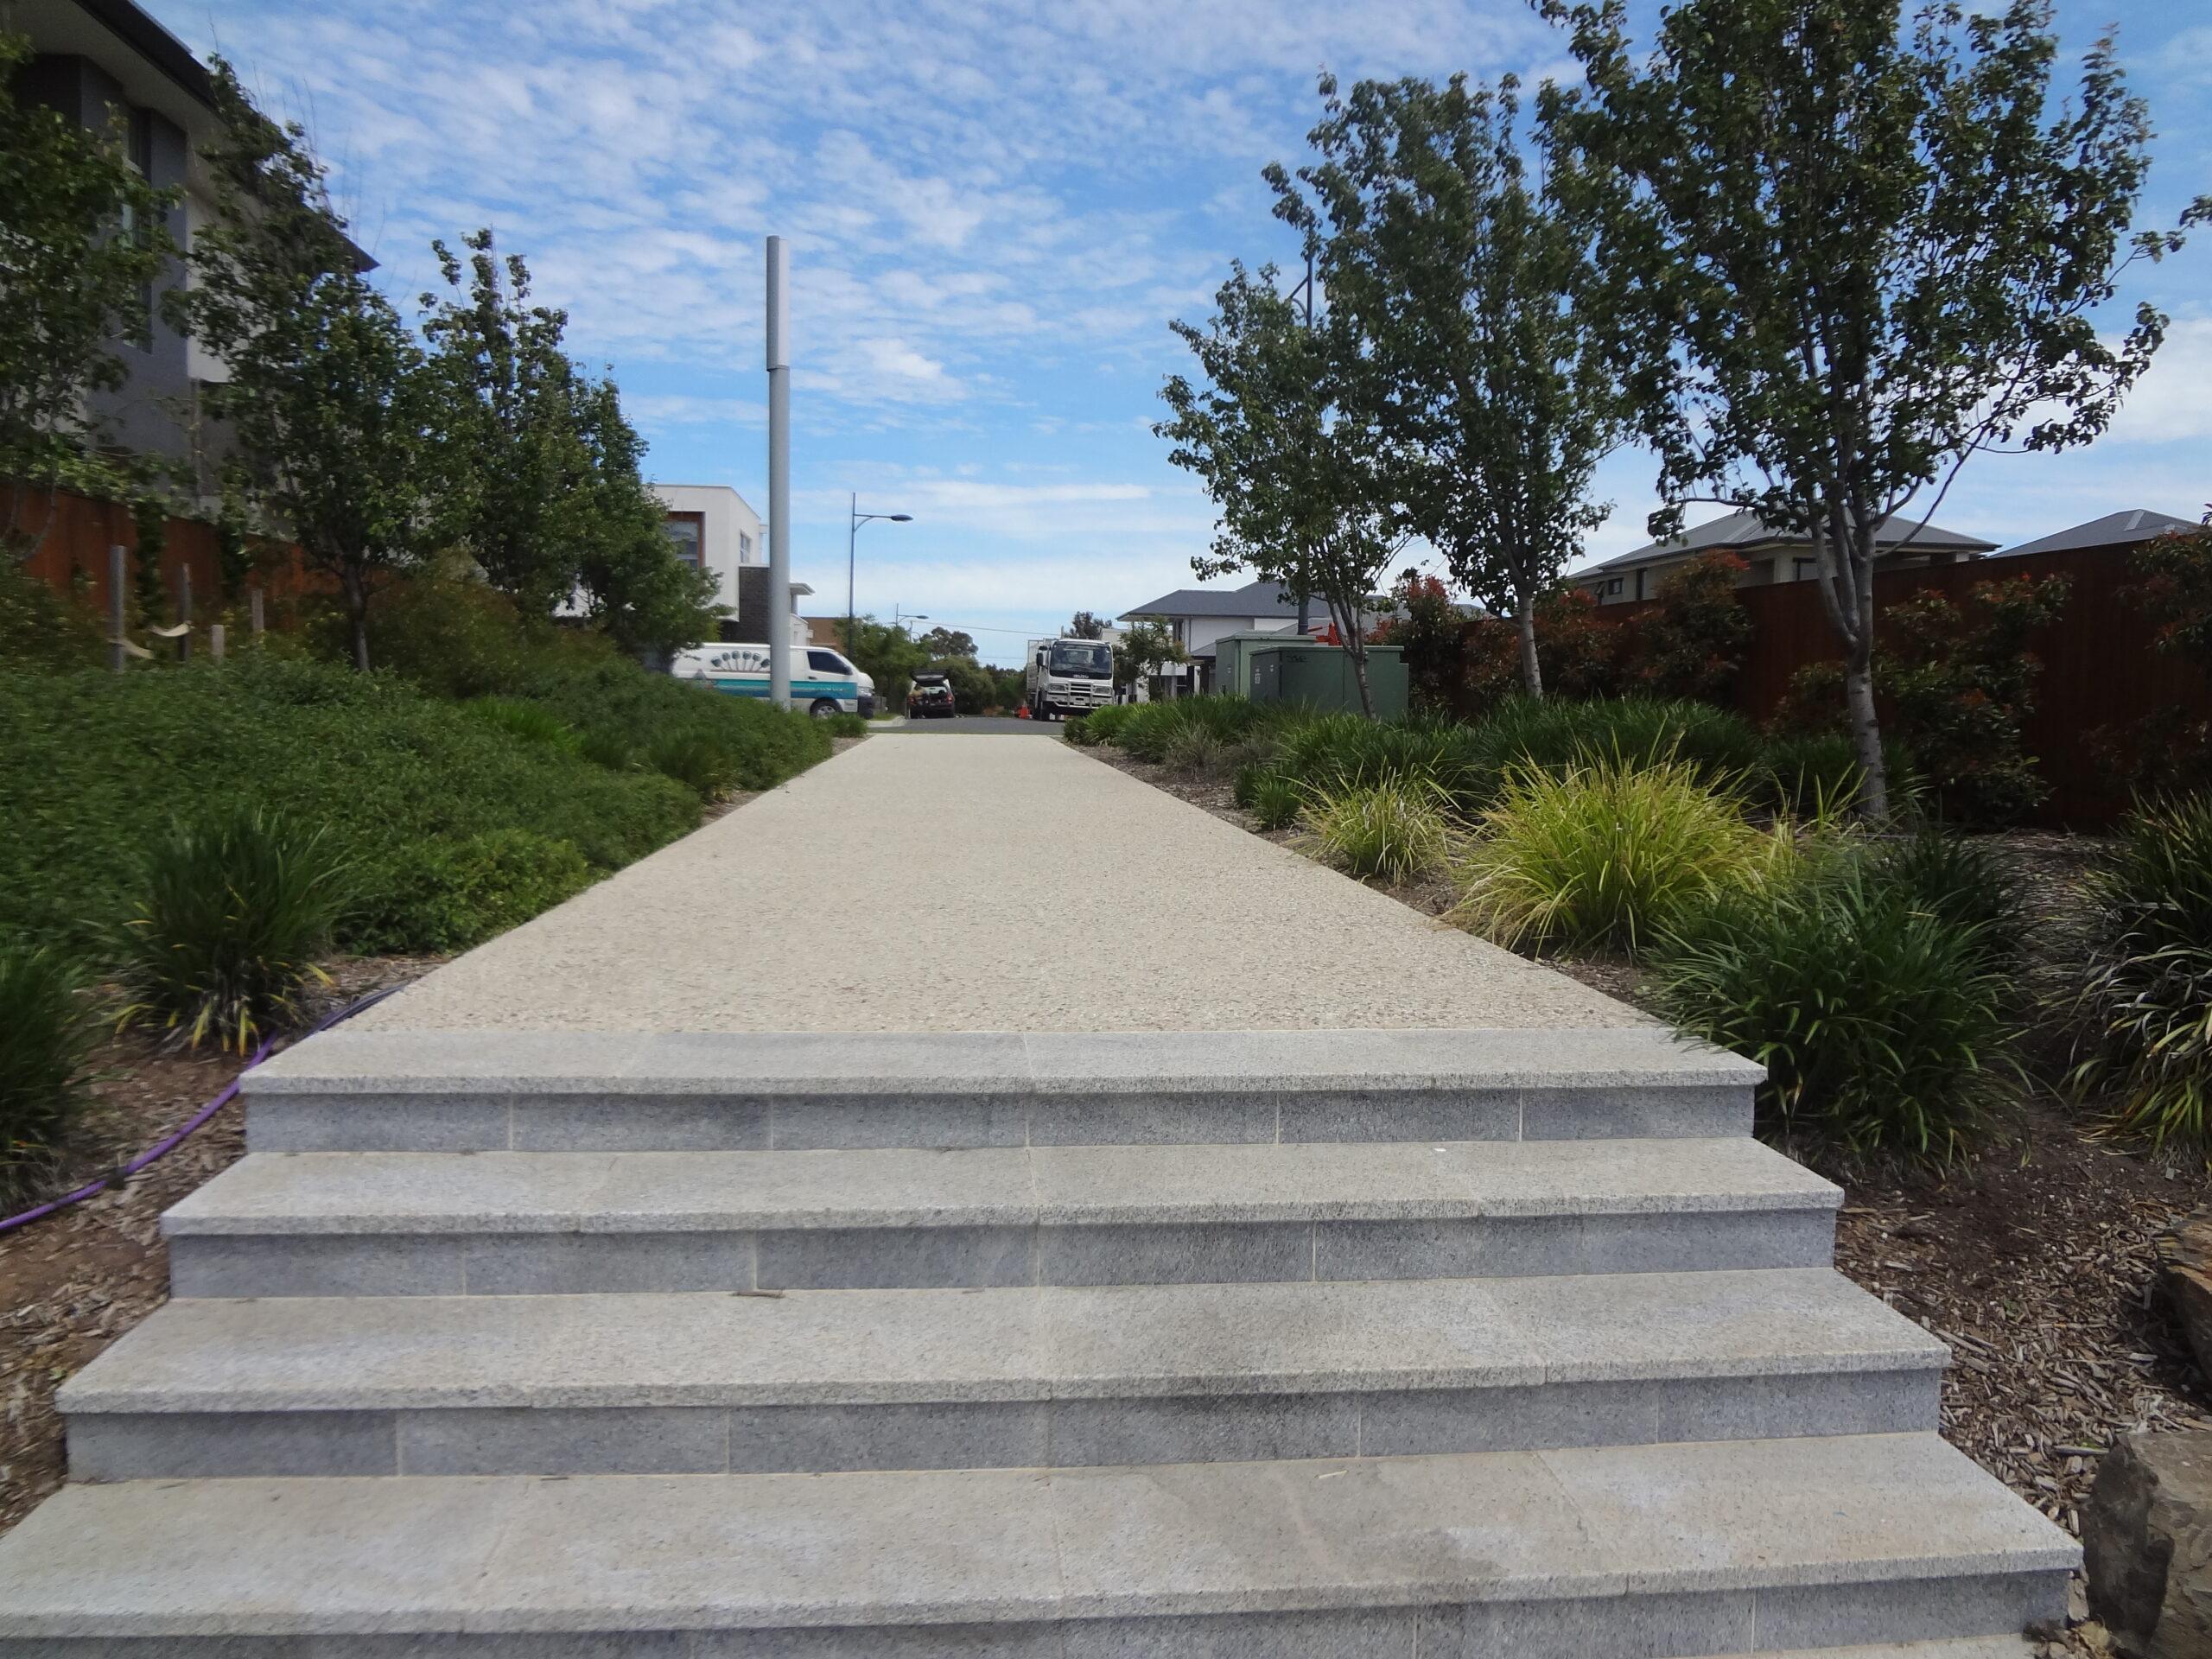 Rochester Street pedestrian walkway, Lightsview - stormwater harvesting and re-useSt pedestrian walk_Lightsview_15